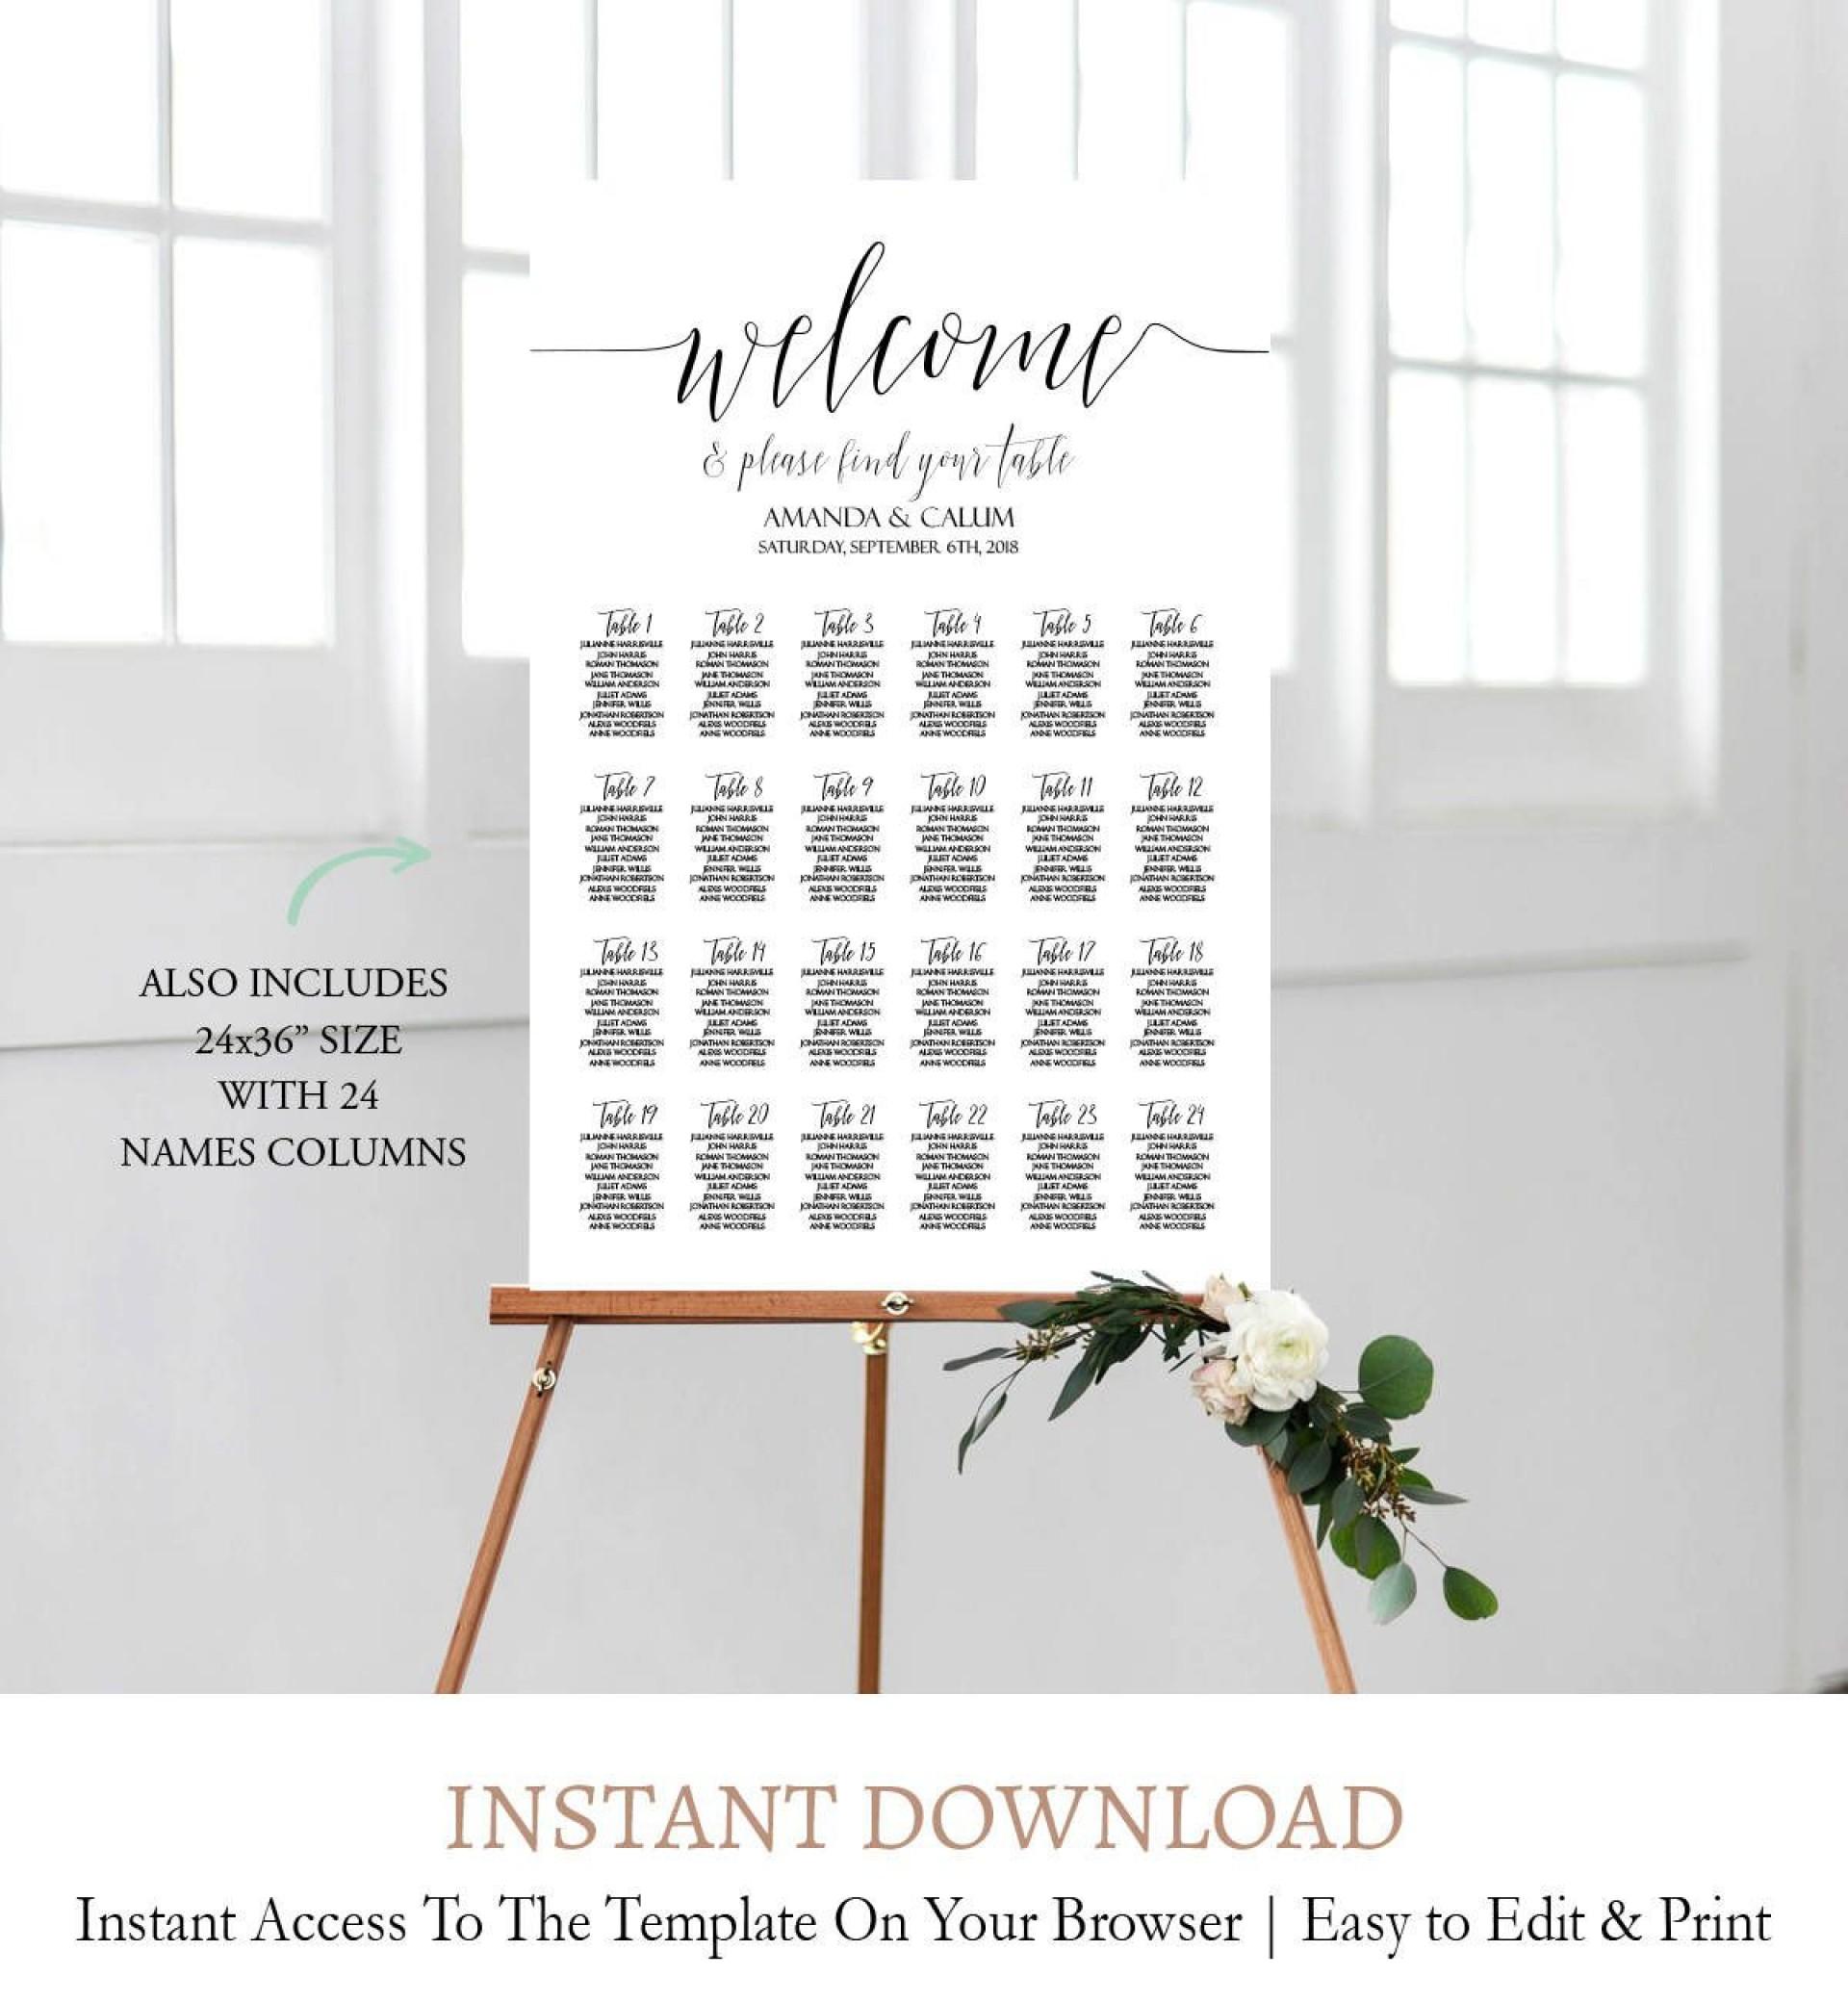 006 Surprising Wedding Seating Chart Template Image  Templates Plan Excel Word Microsoft1920